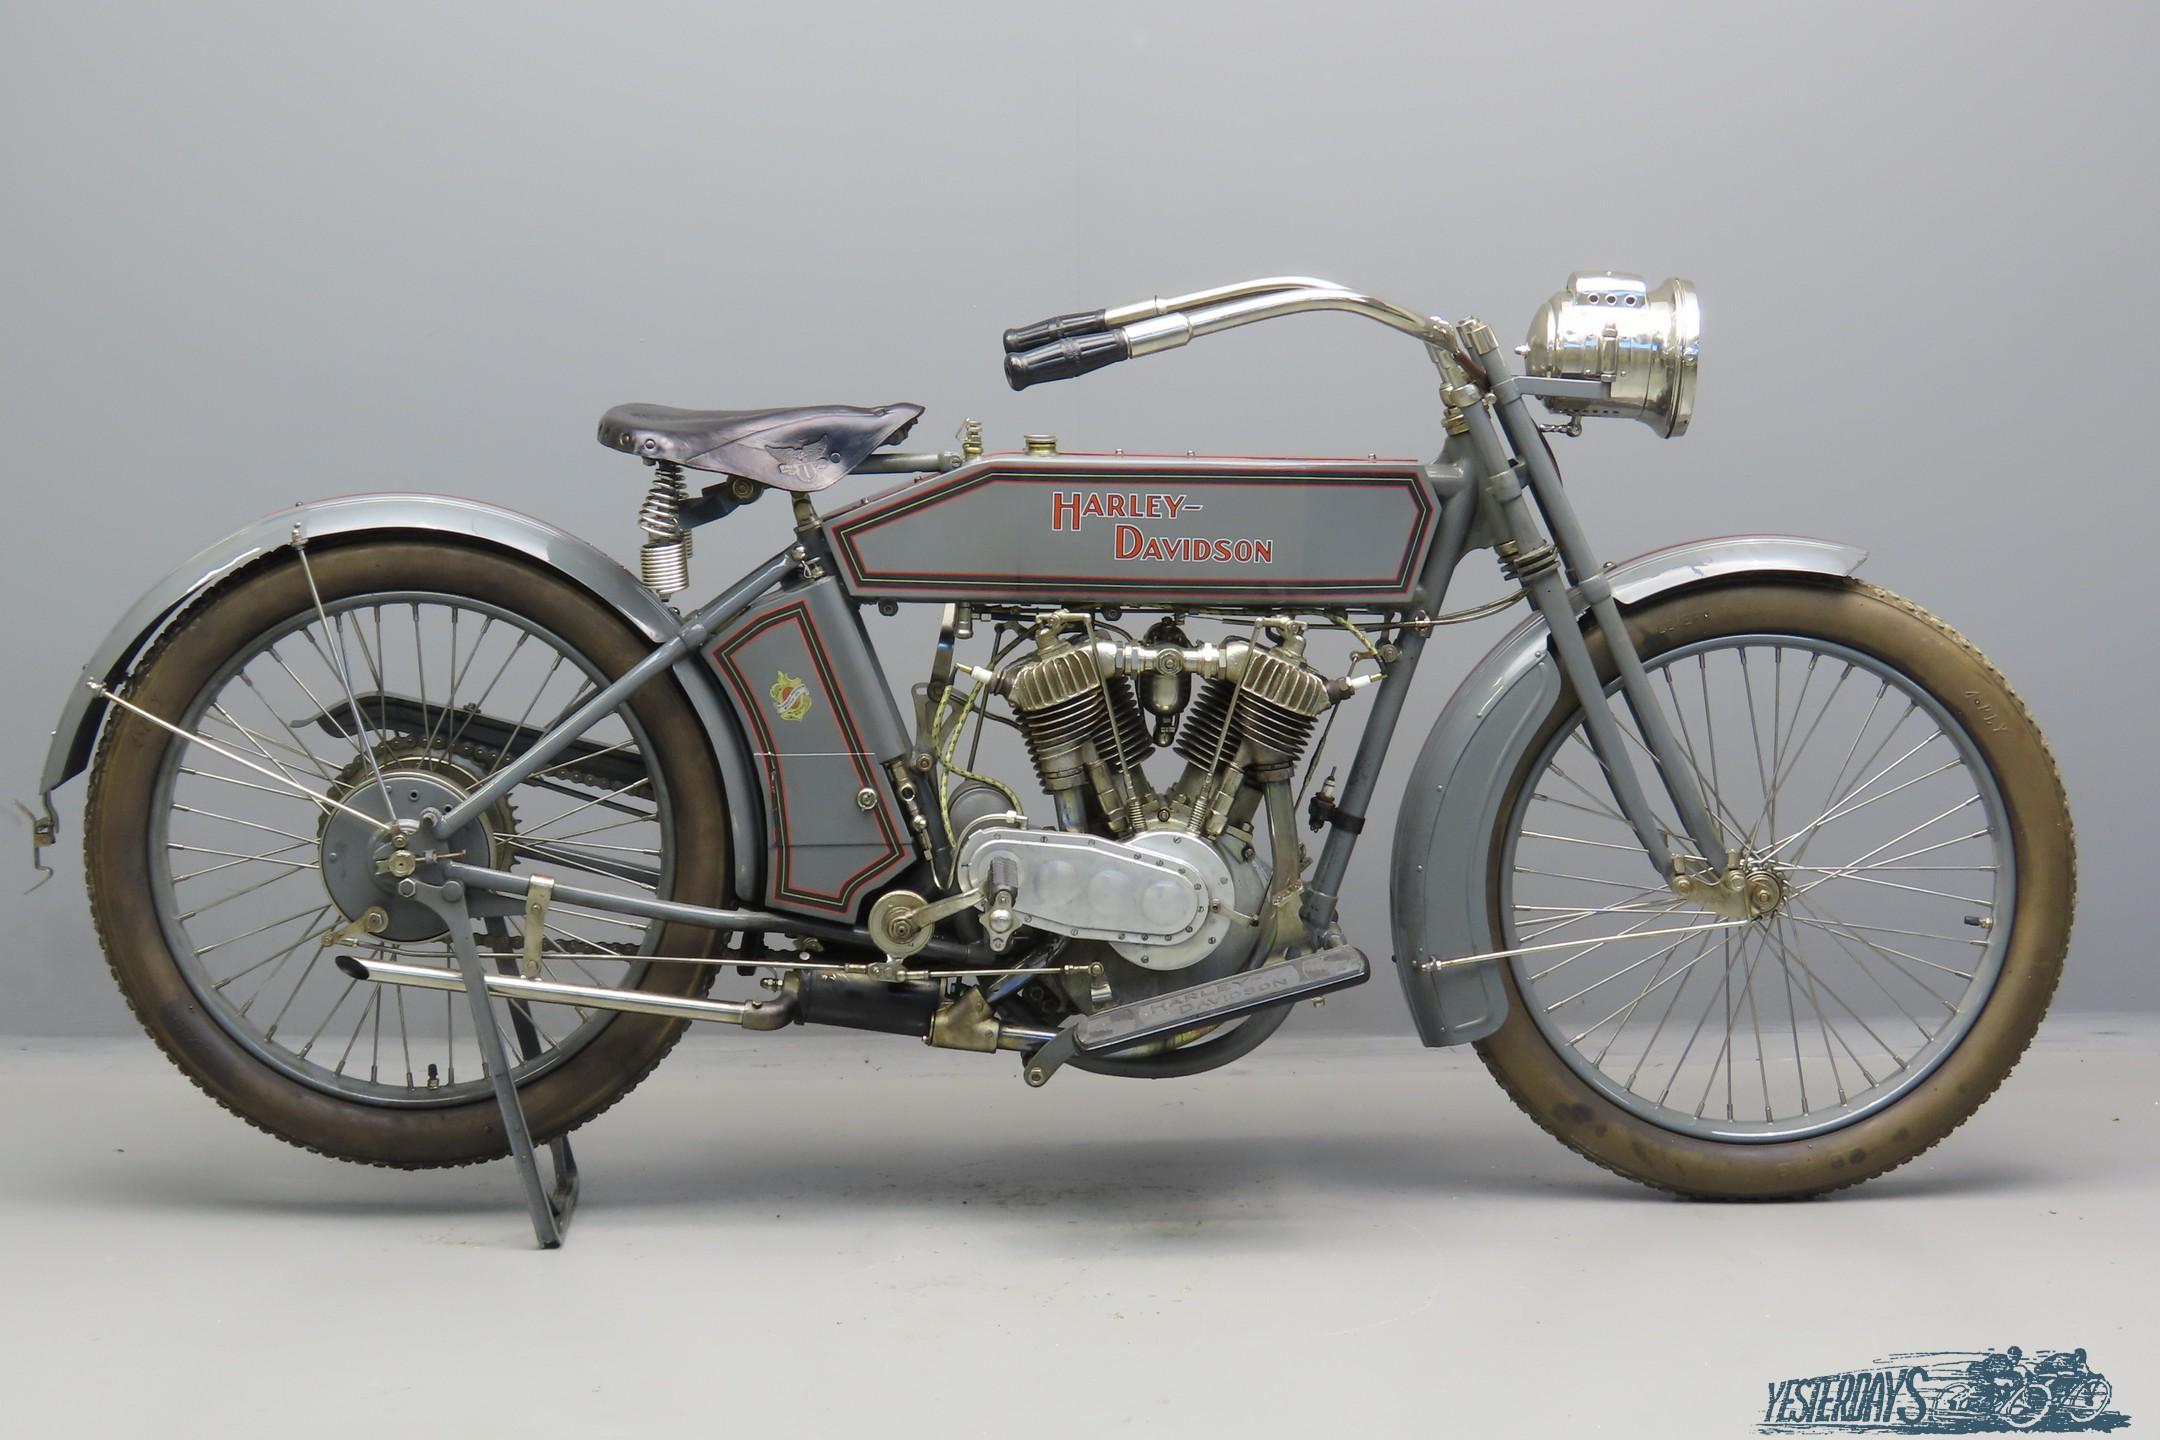 Harley Davidson 1914 Model 10E 1000cc 2 cyl ioe  3009